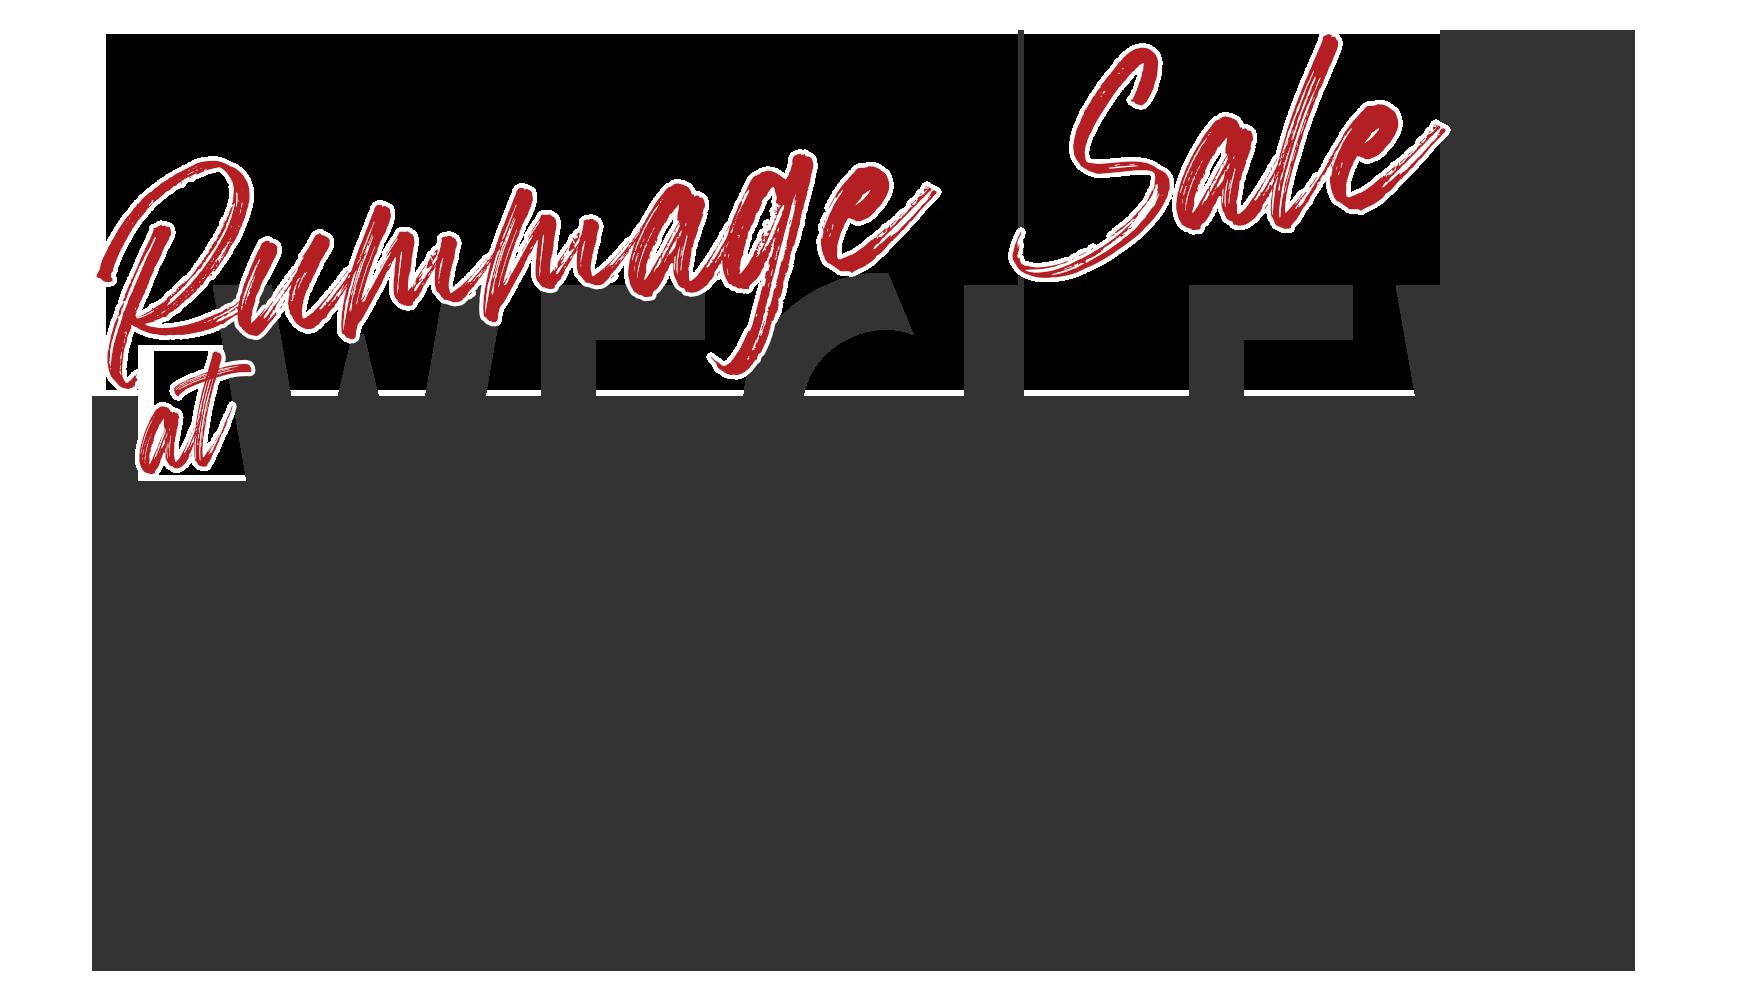 rummage sale at wesley umc